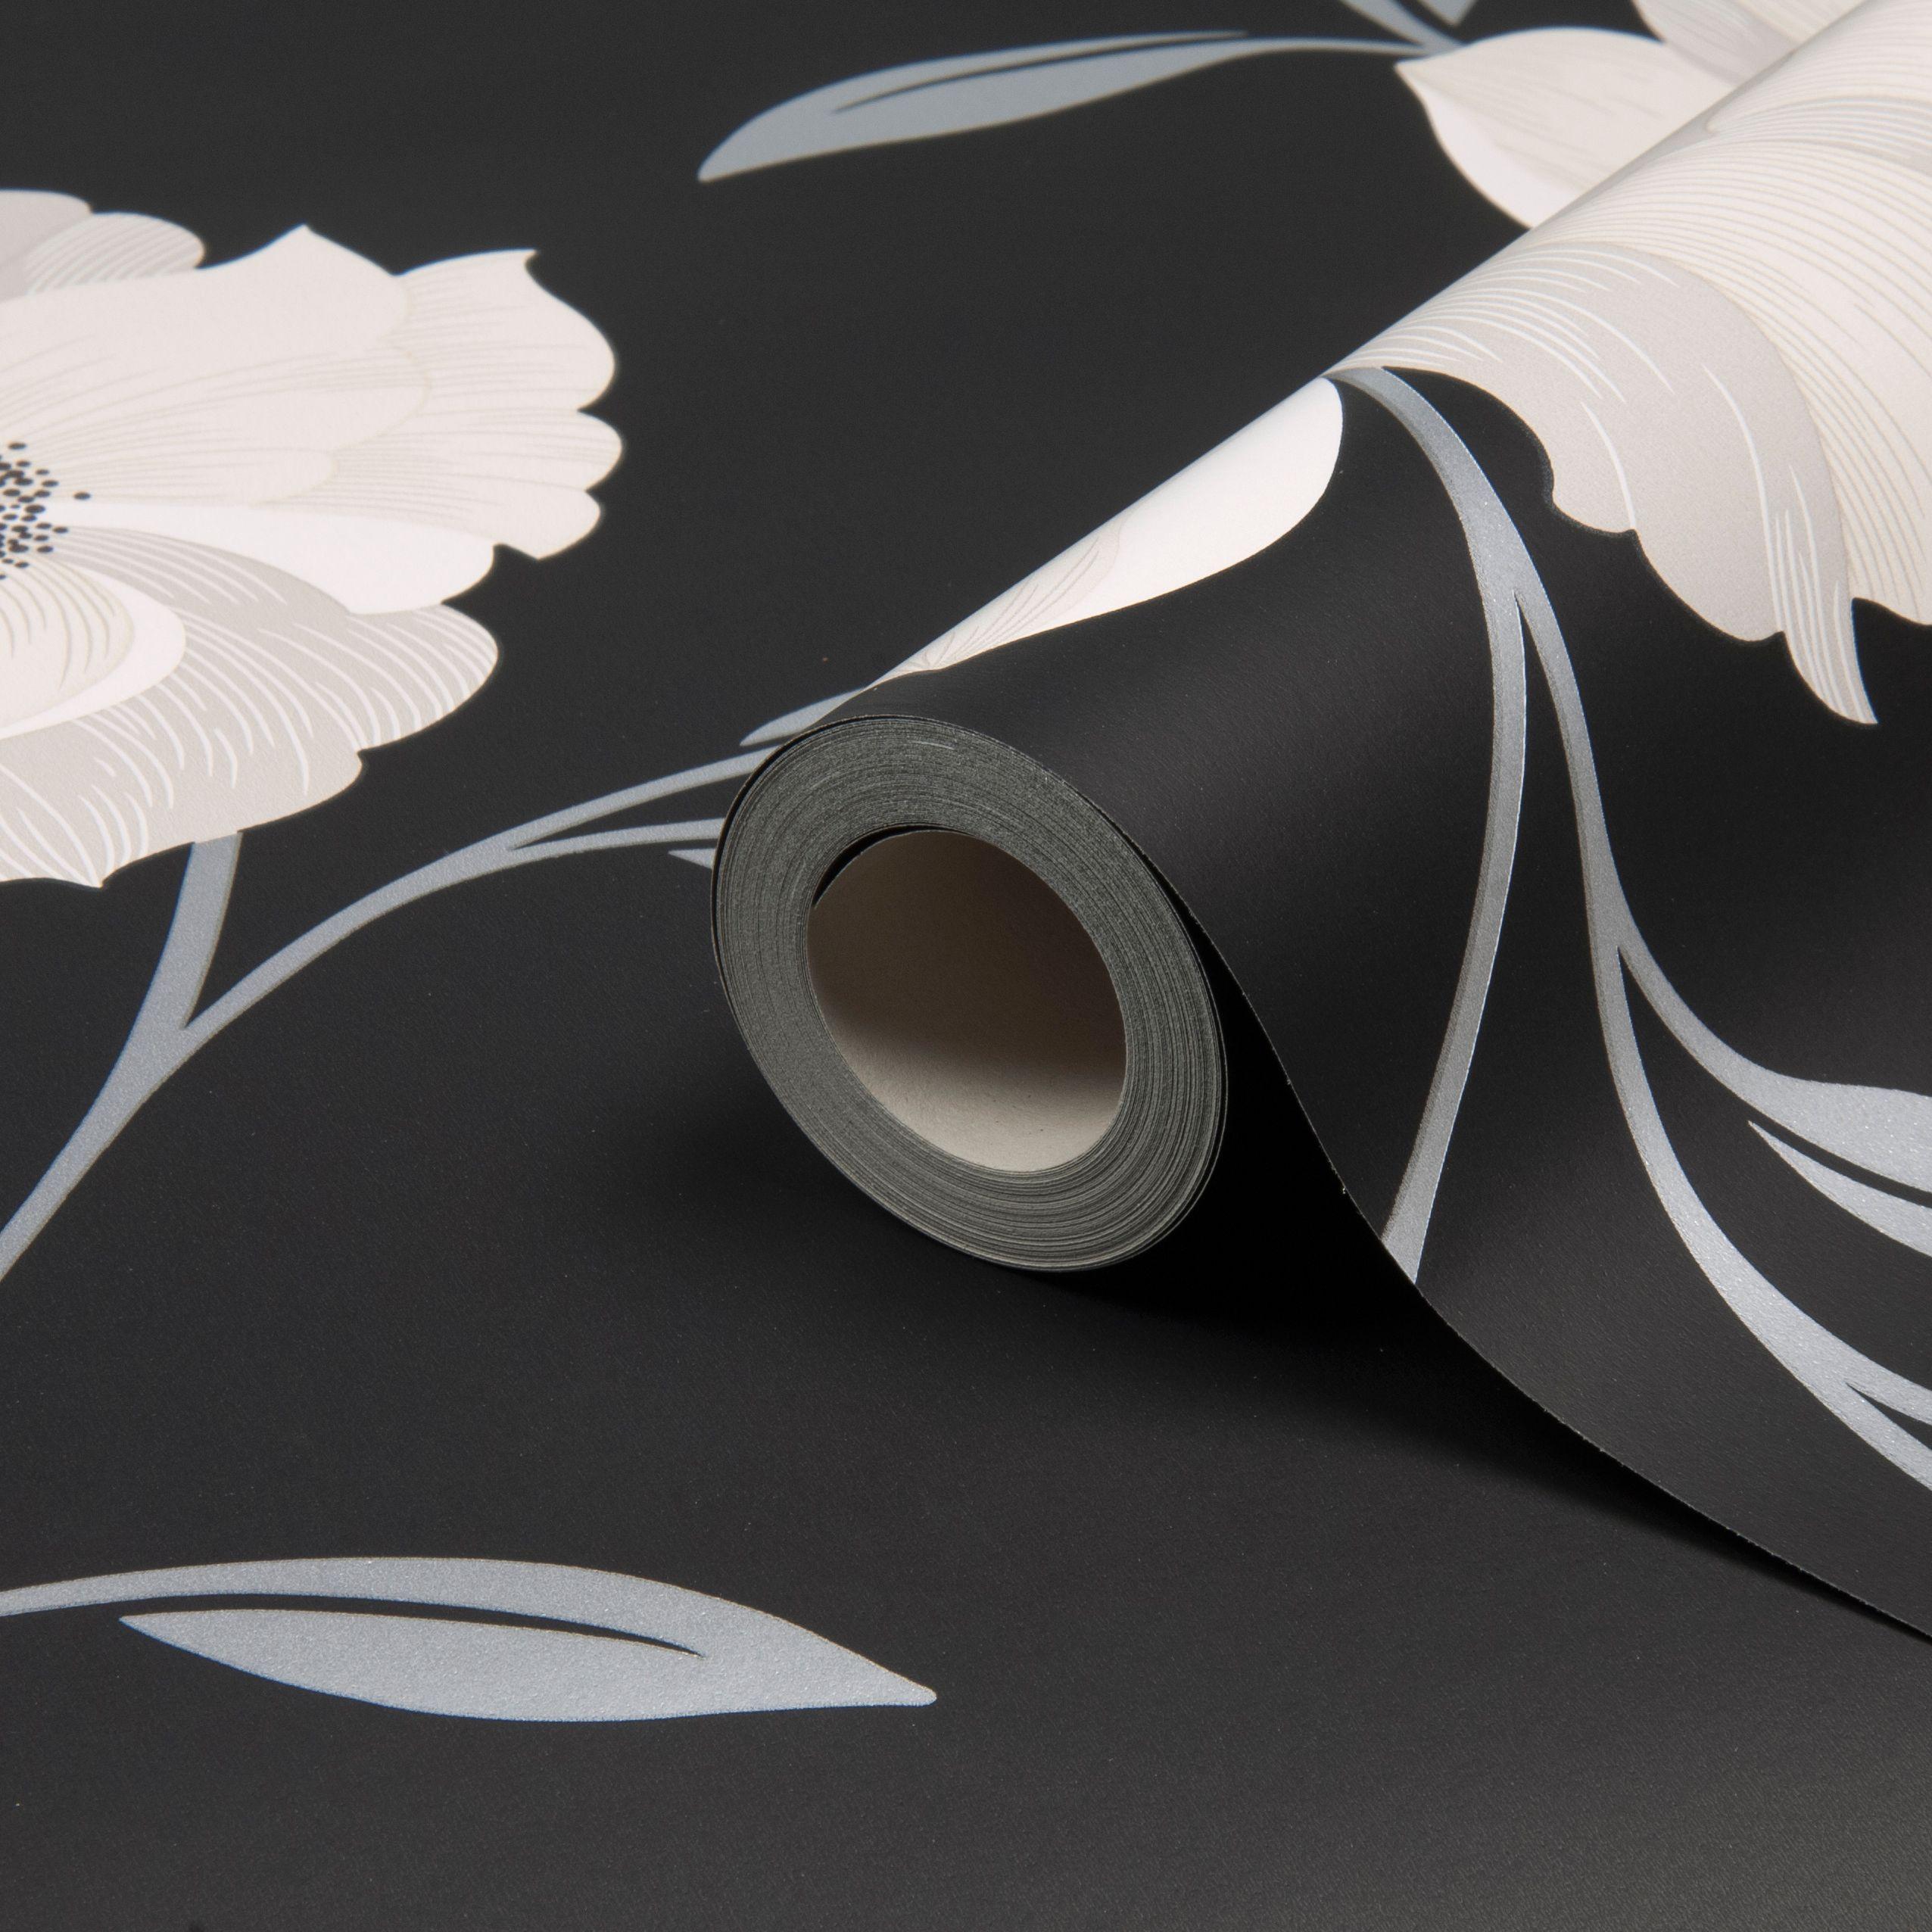 Home diy wallpaper illustration arthouse imagine fern plum motif vinyl - Arthouse Opera Charleston Black White Floral Wallpaper